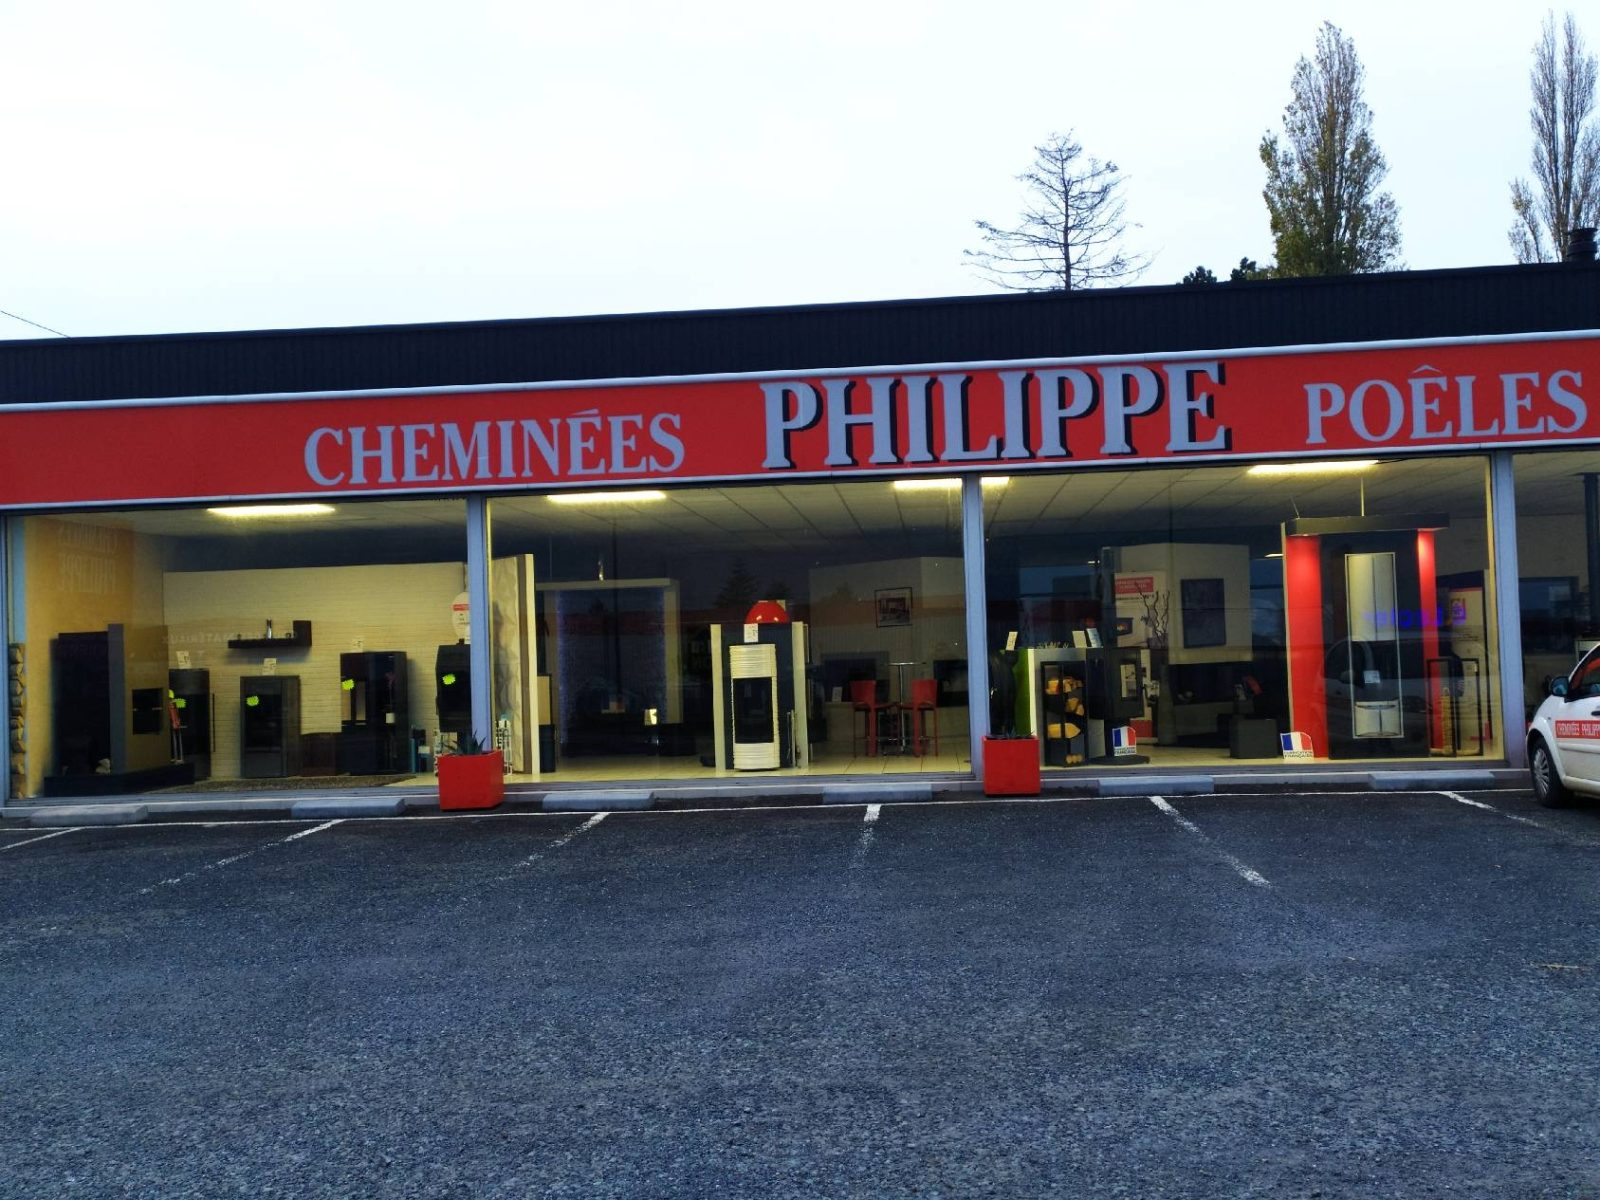 Cheminées Philippe Poêles A Bois Cheminees Philippe 1